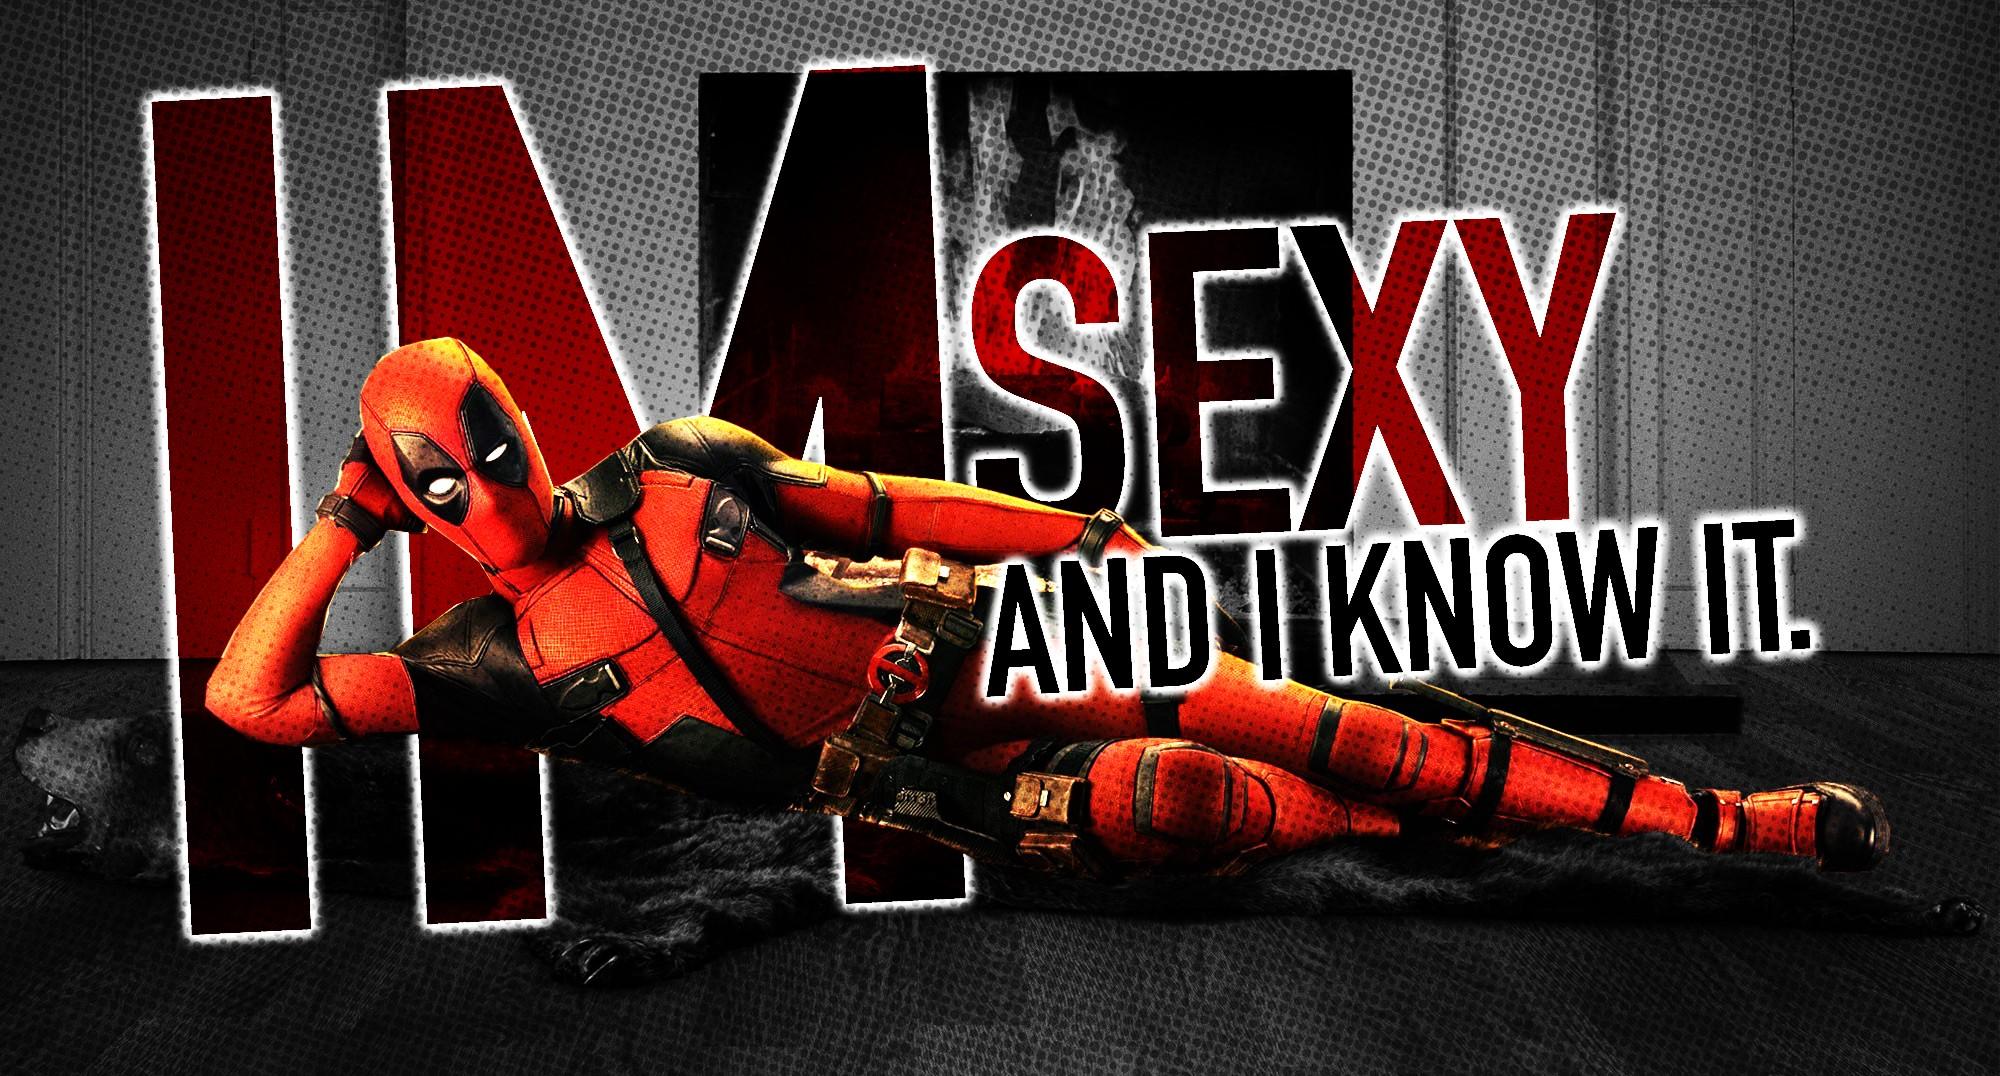 Wallpaper : red, Marvel Comics, Deadpool, poster, Ryan ...